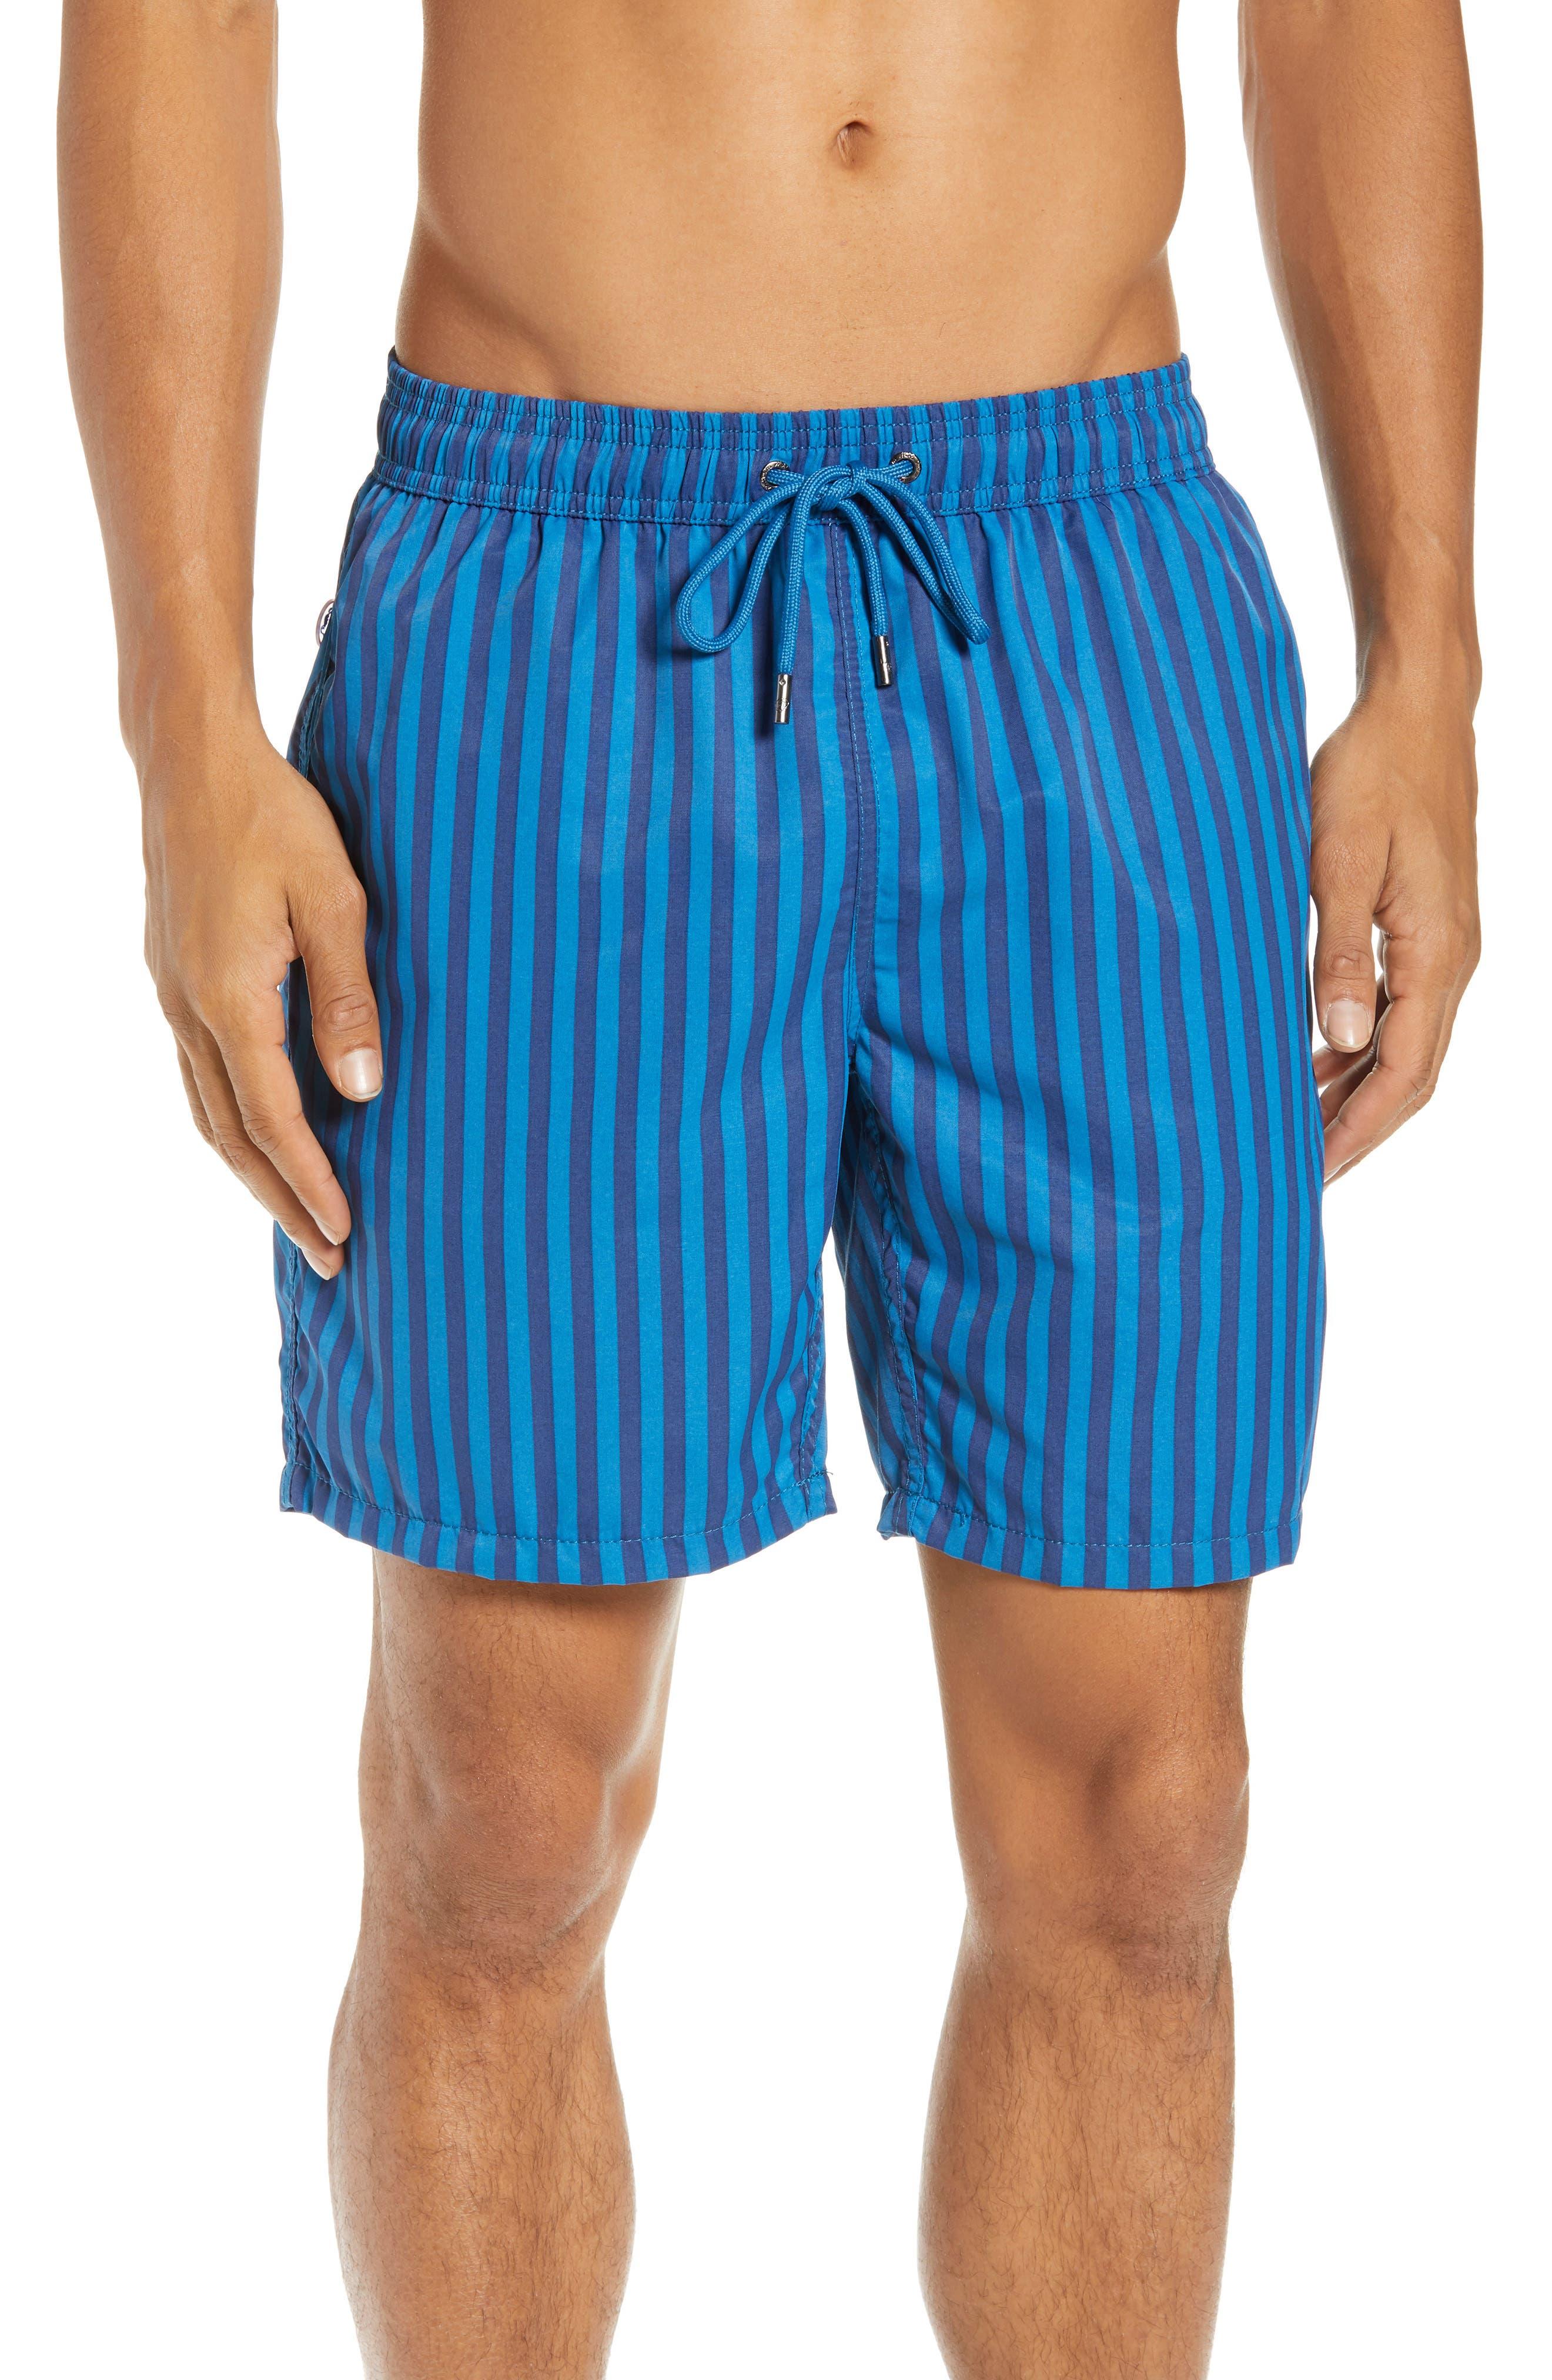 Mr. Swim Cabana Stripe Swim Trunks,                         Main,                         color, NAVY/ ROYAL